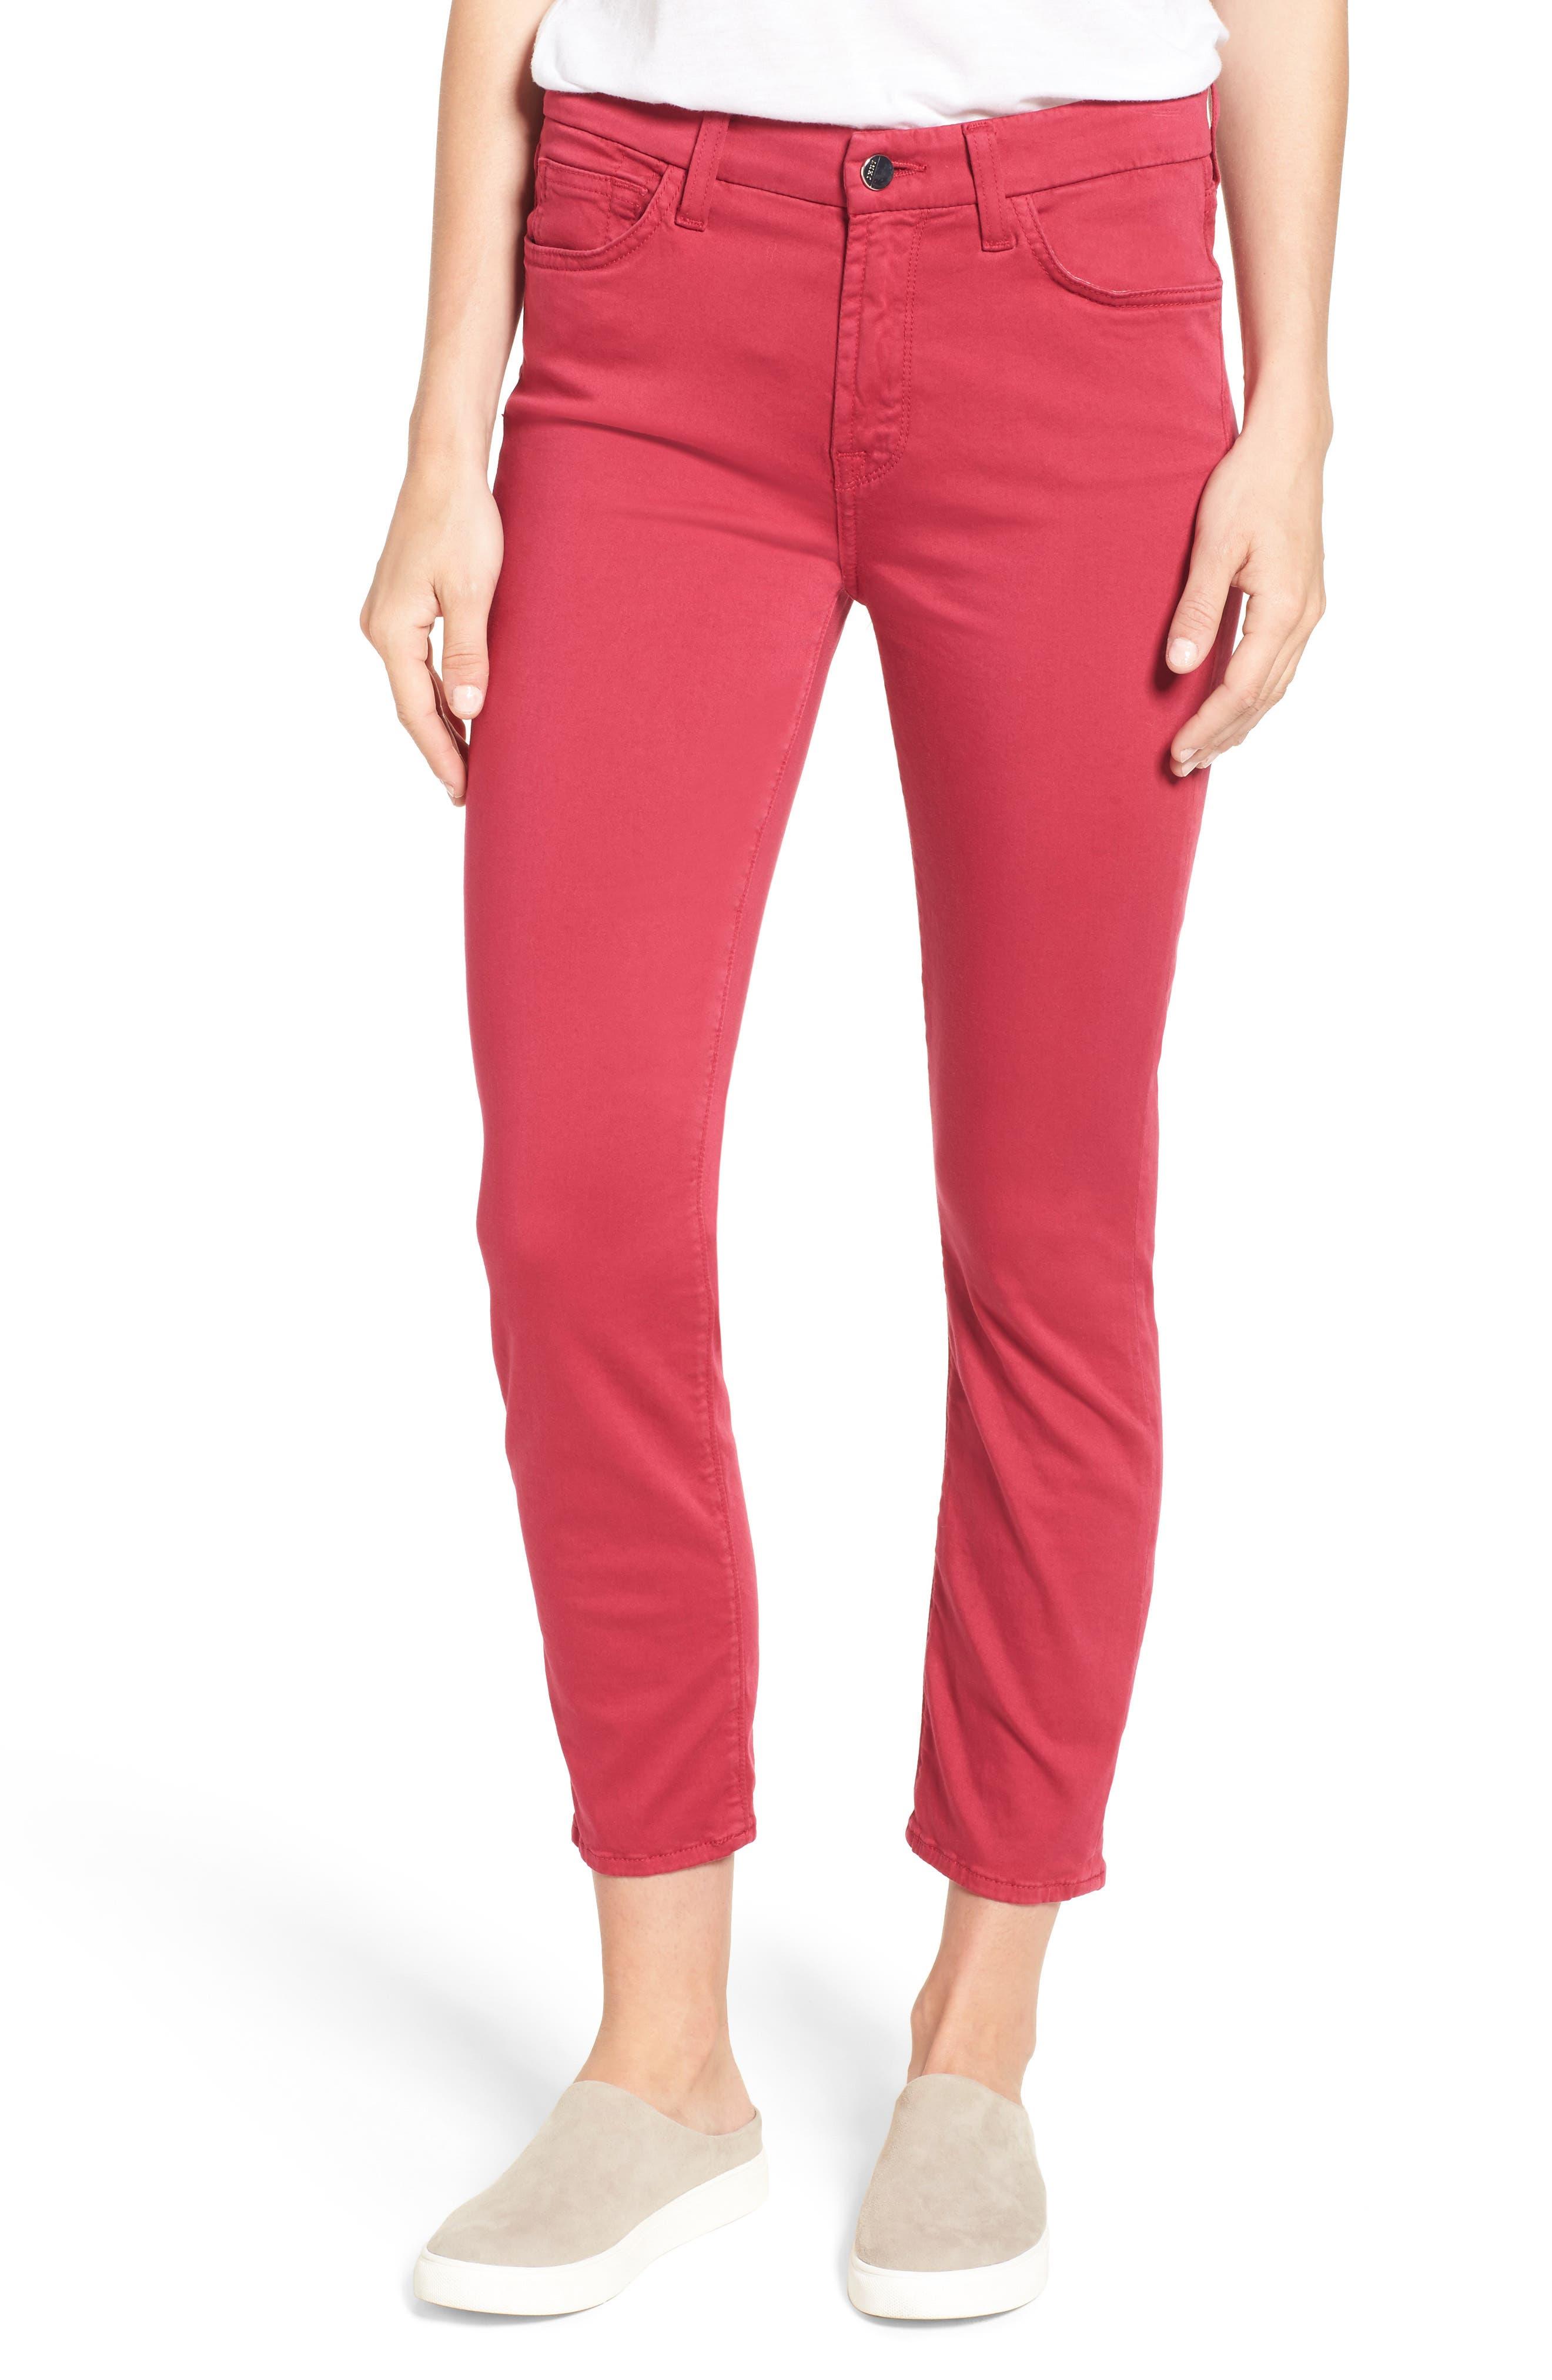 Alternate Image 1 Selected - Jen7 Crop Sateen Skinny Jeans